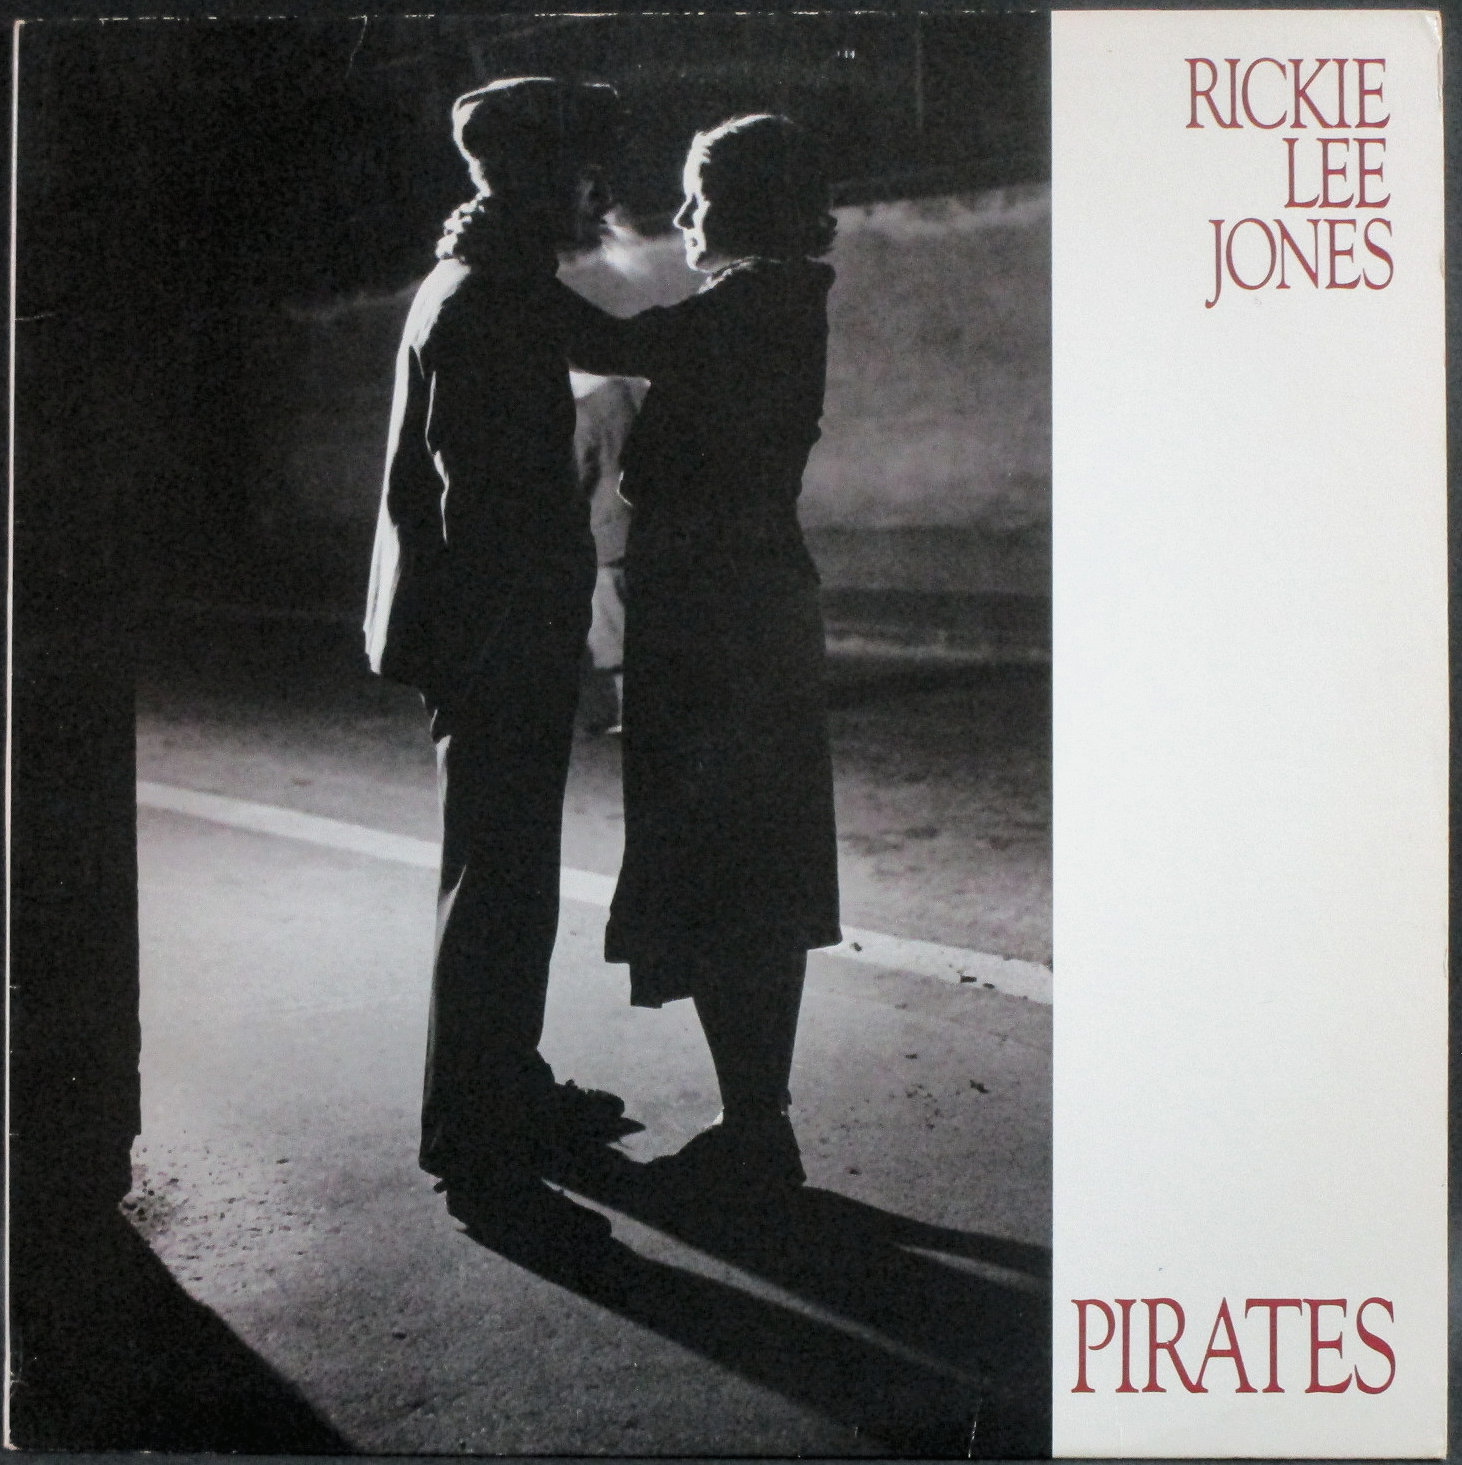 Rickie Lee Jones リッキー・リー・ジョーンズ / Pirates